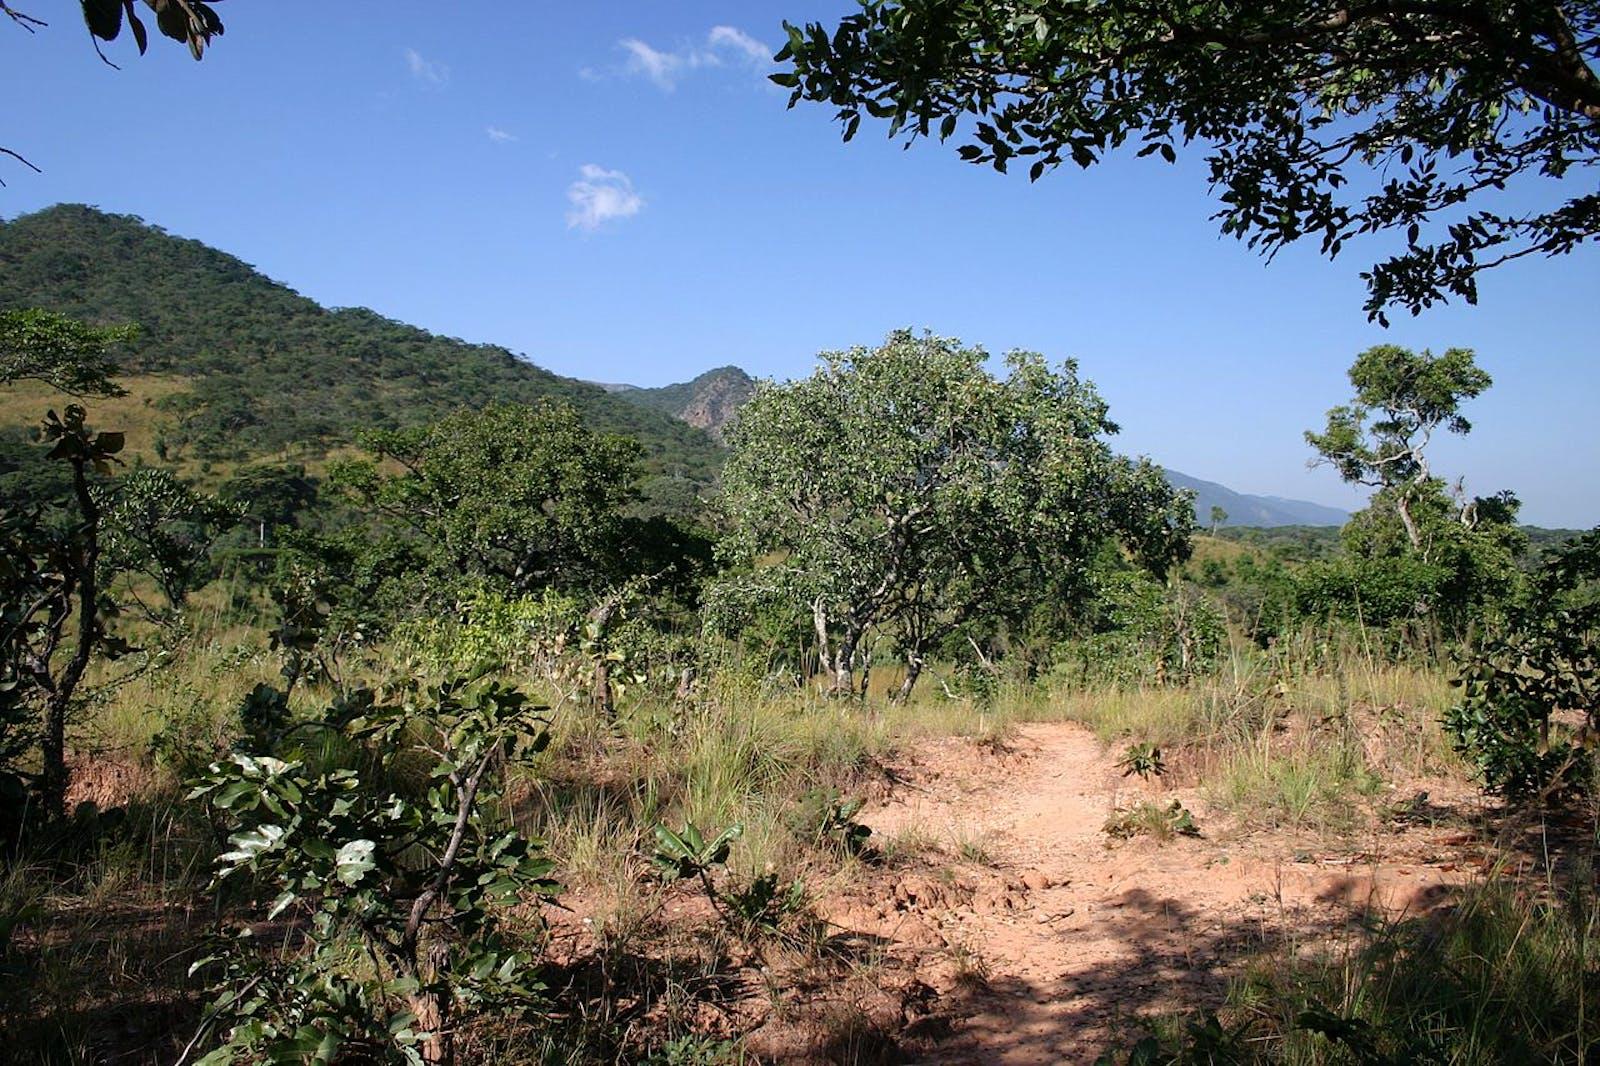 Central Zambezian Wet Miombo Woodlands